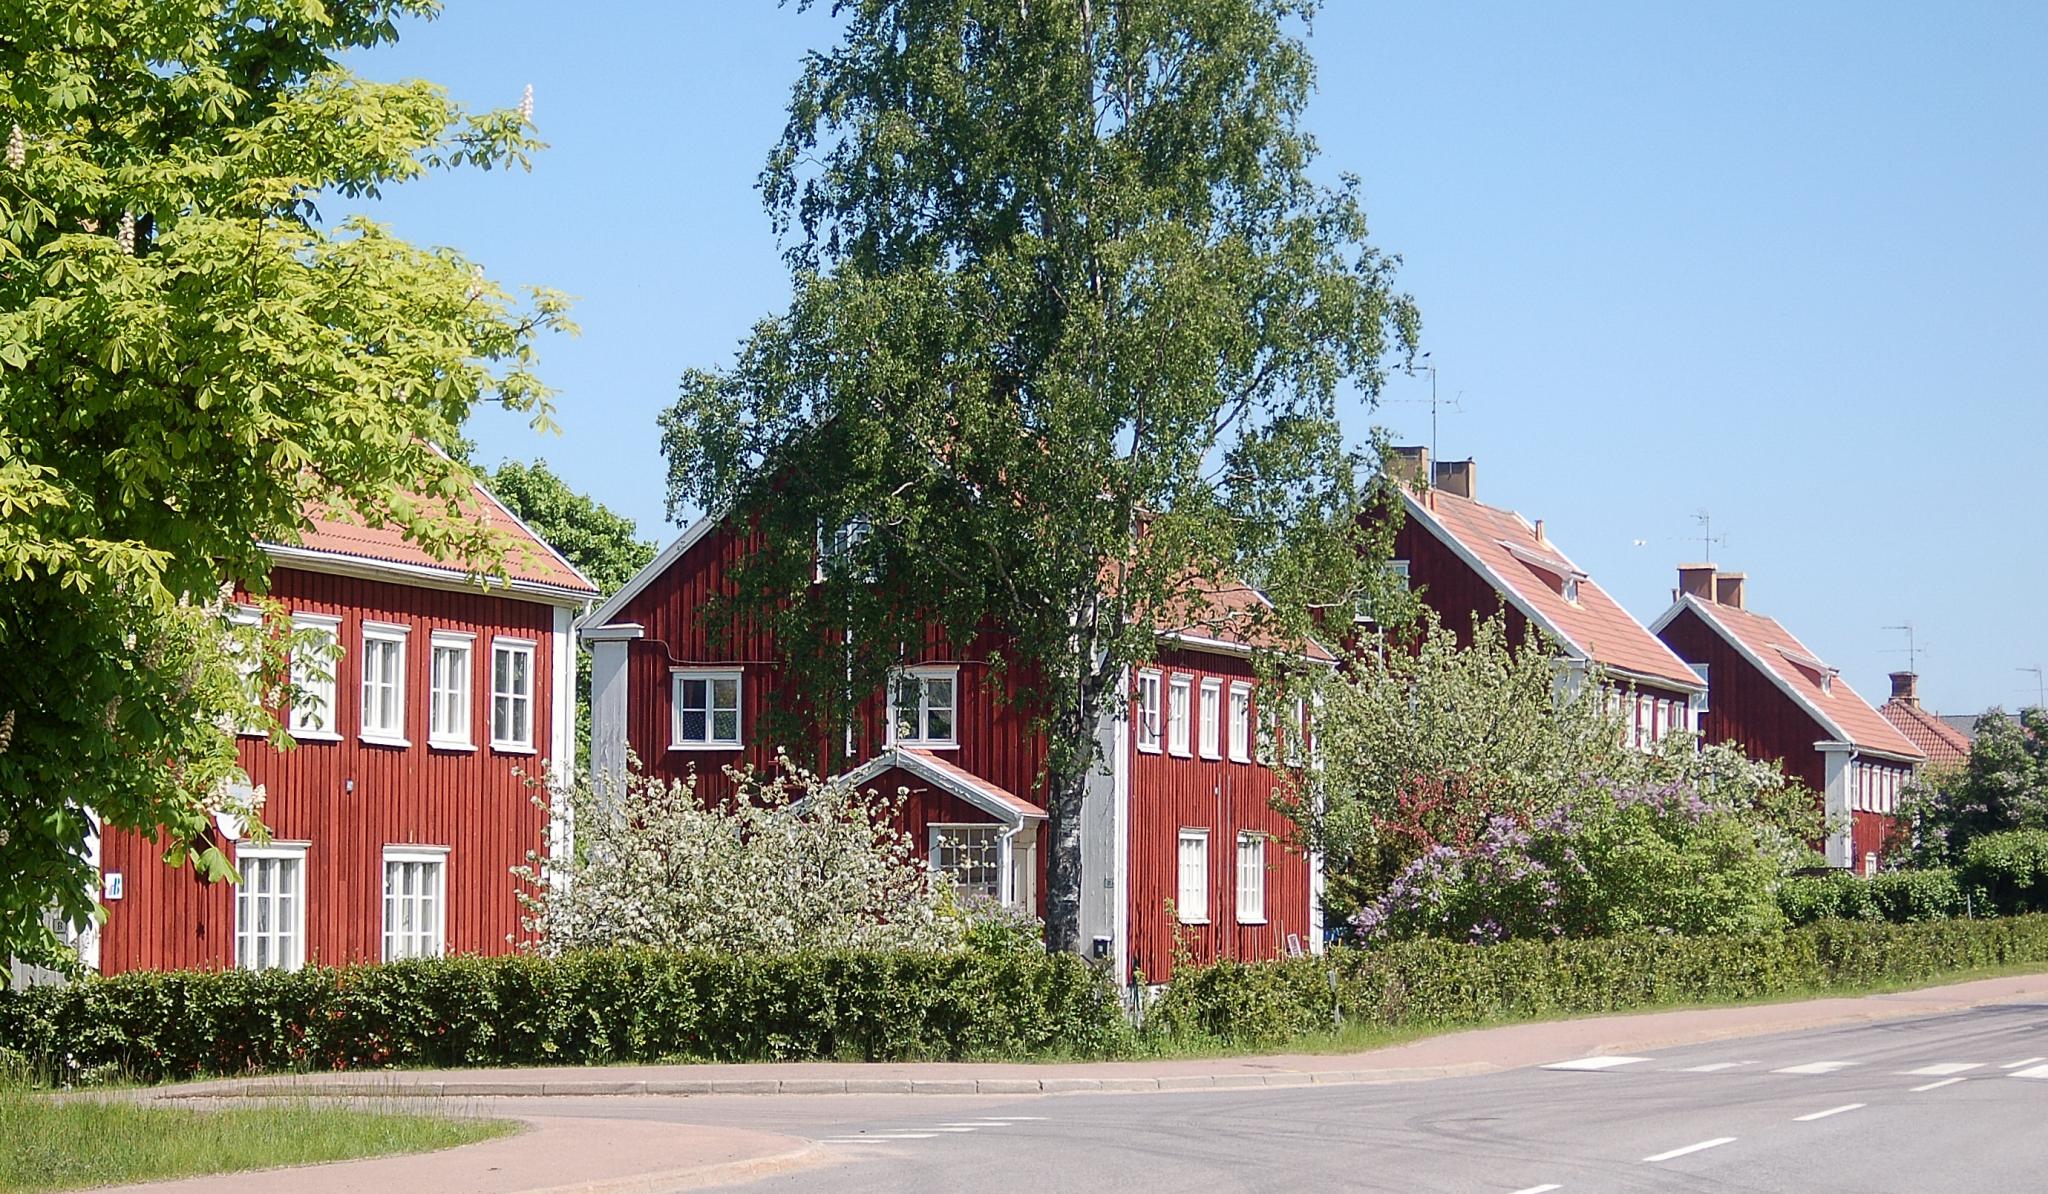 Skoghall